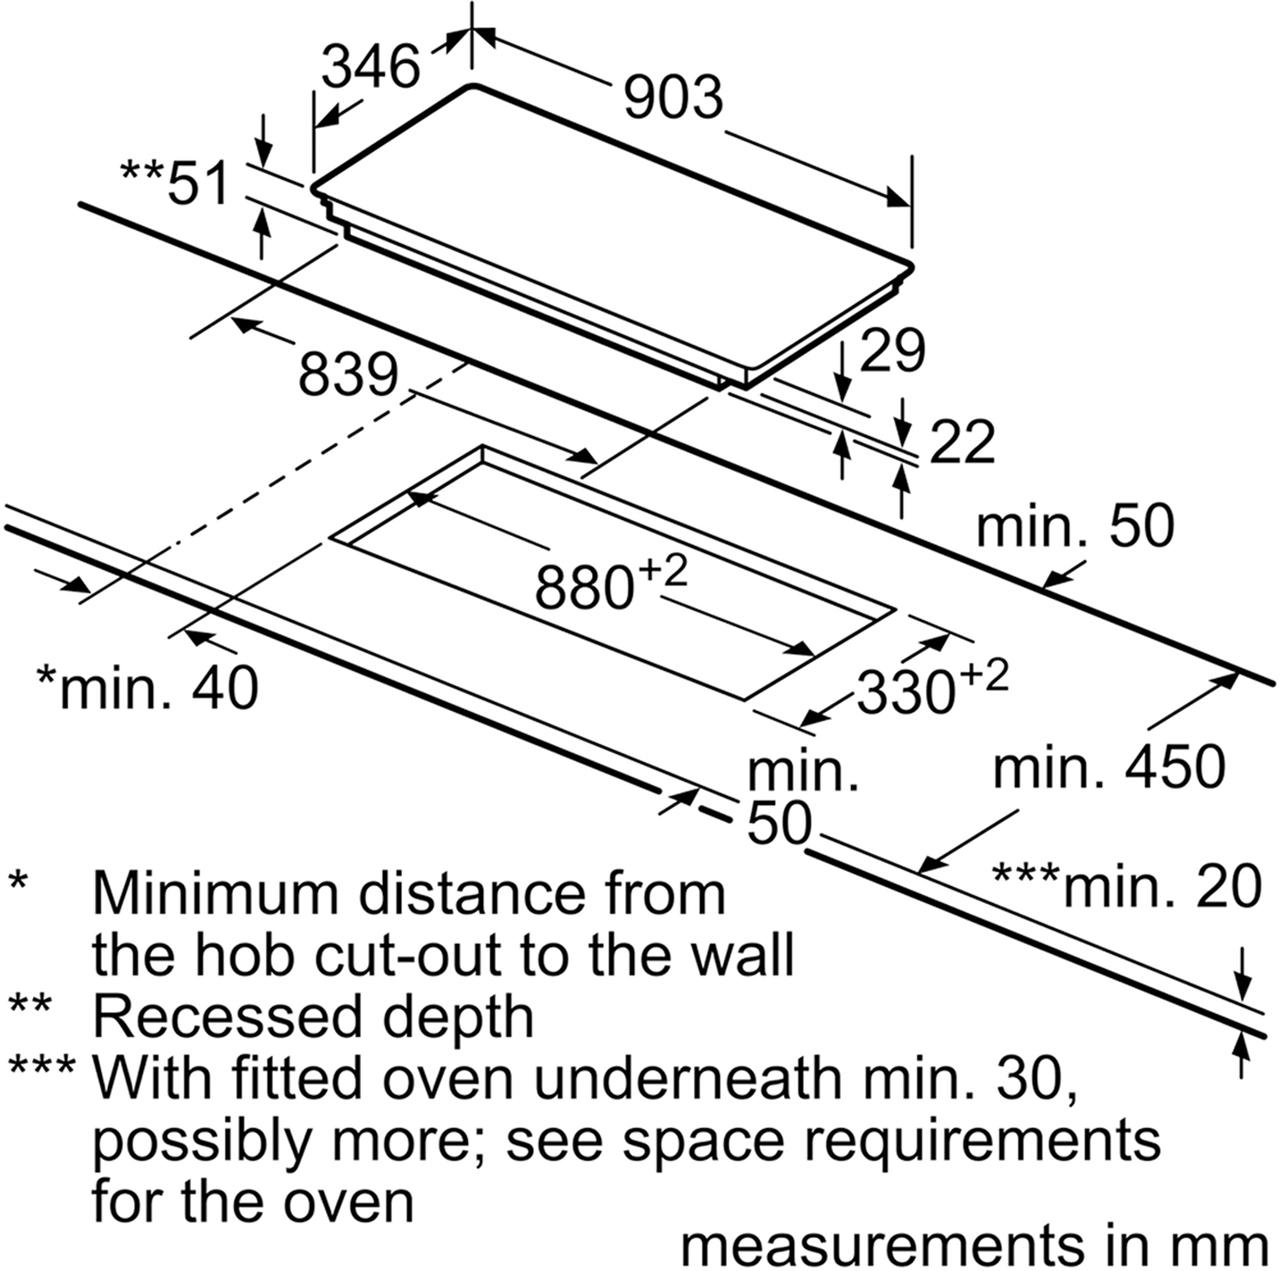 cooker wiring diagrams uk 1999 chevy silverado brake line diagram neff euiu ortholinc de hob instructions electricity site rh melo westkentbuses co t48fd23x0